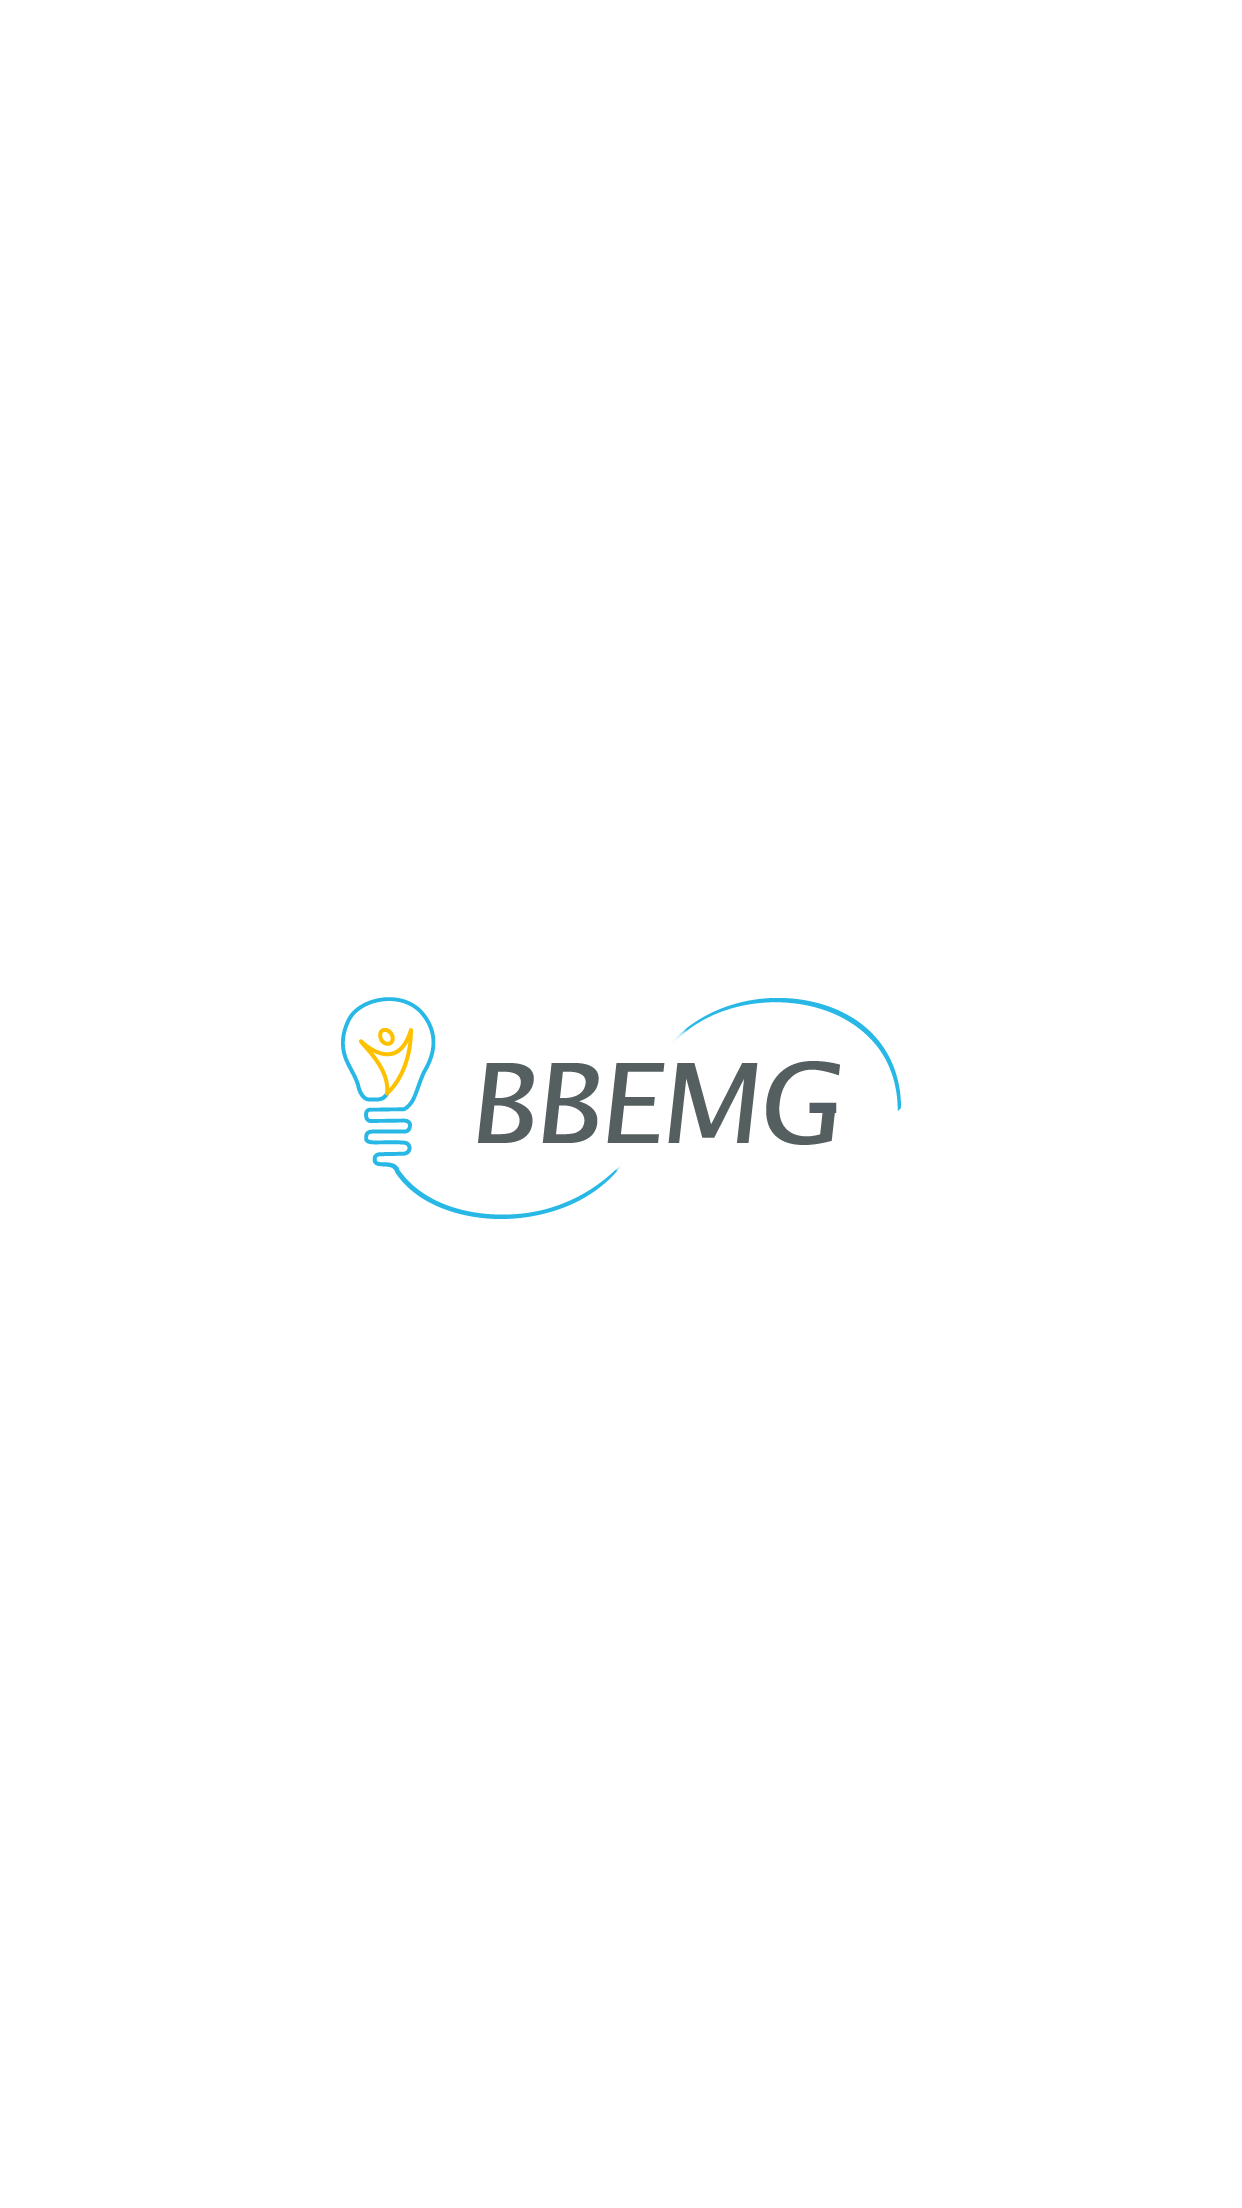 contrib/mobile/iOS/Onelab/Images_BBEMG.xcassets/LaunchImage.launchimage/splash1242x2208.png